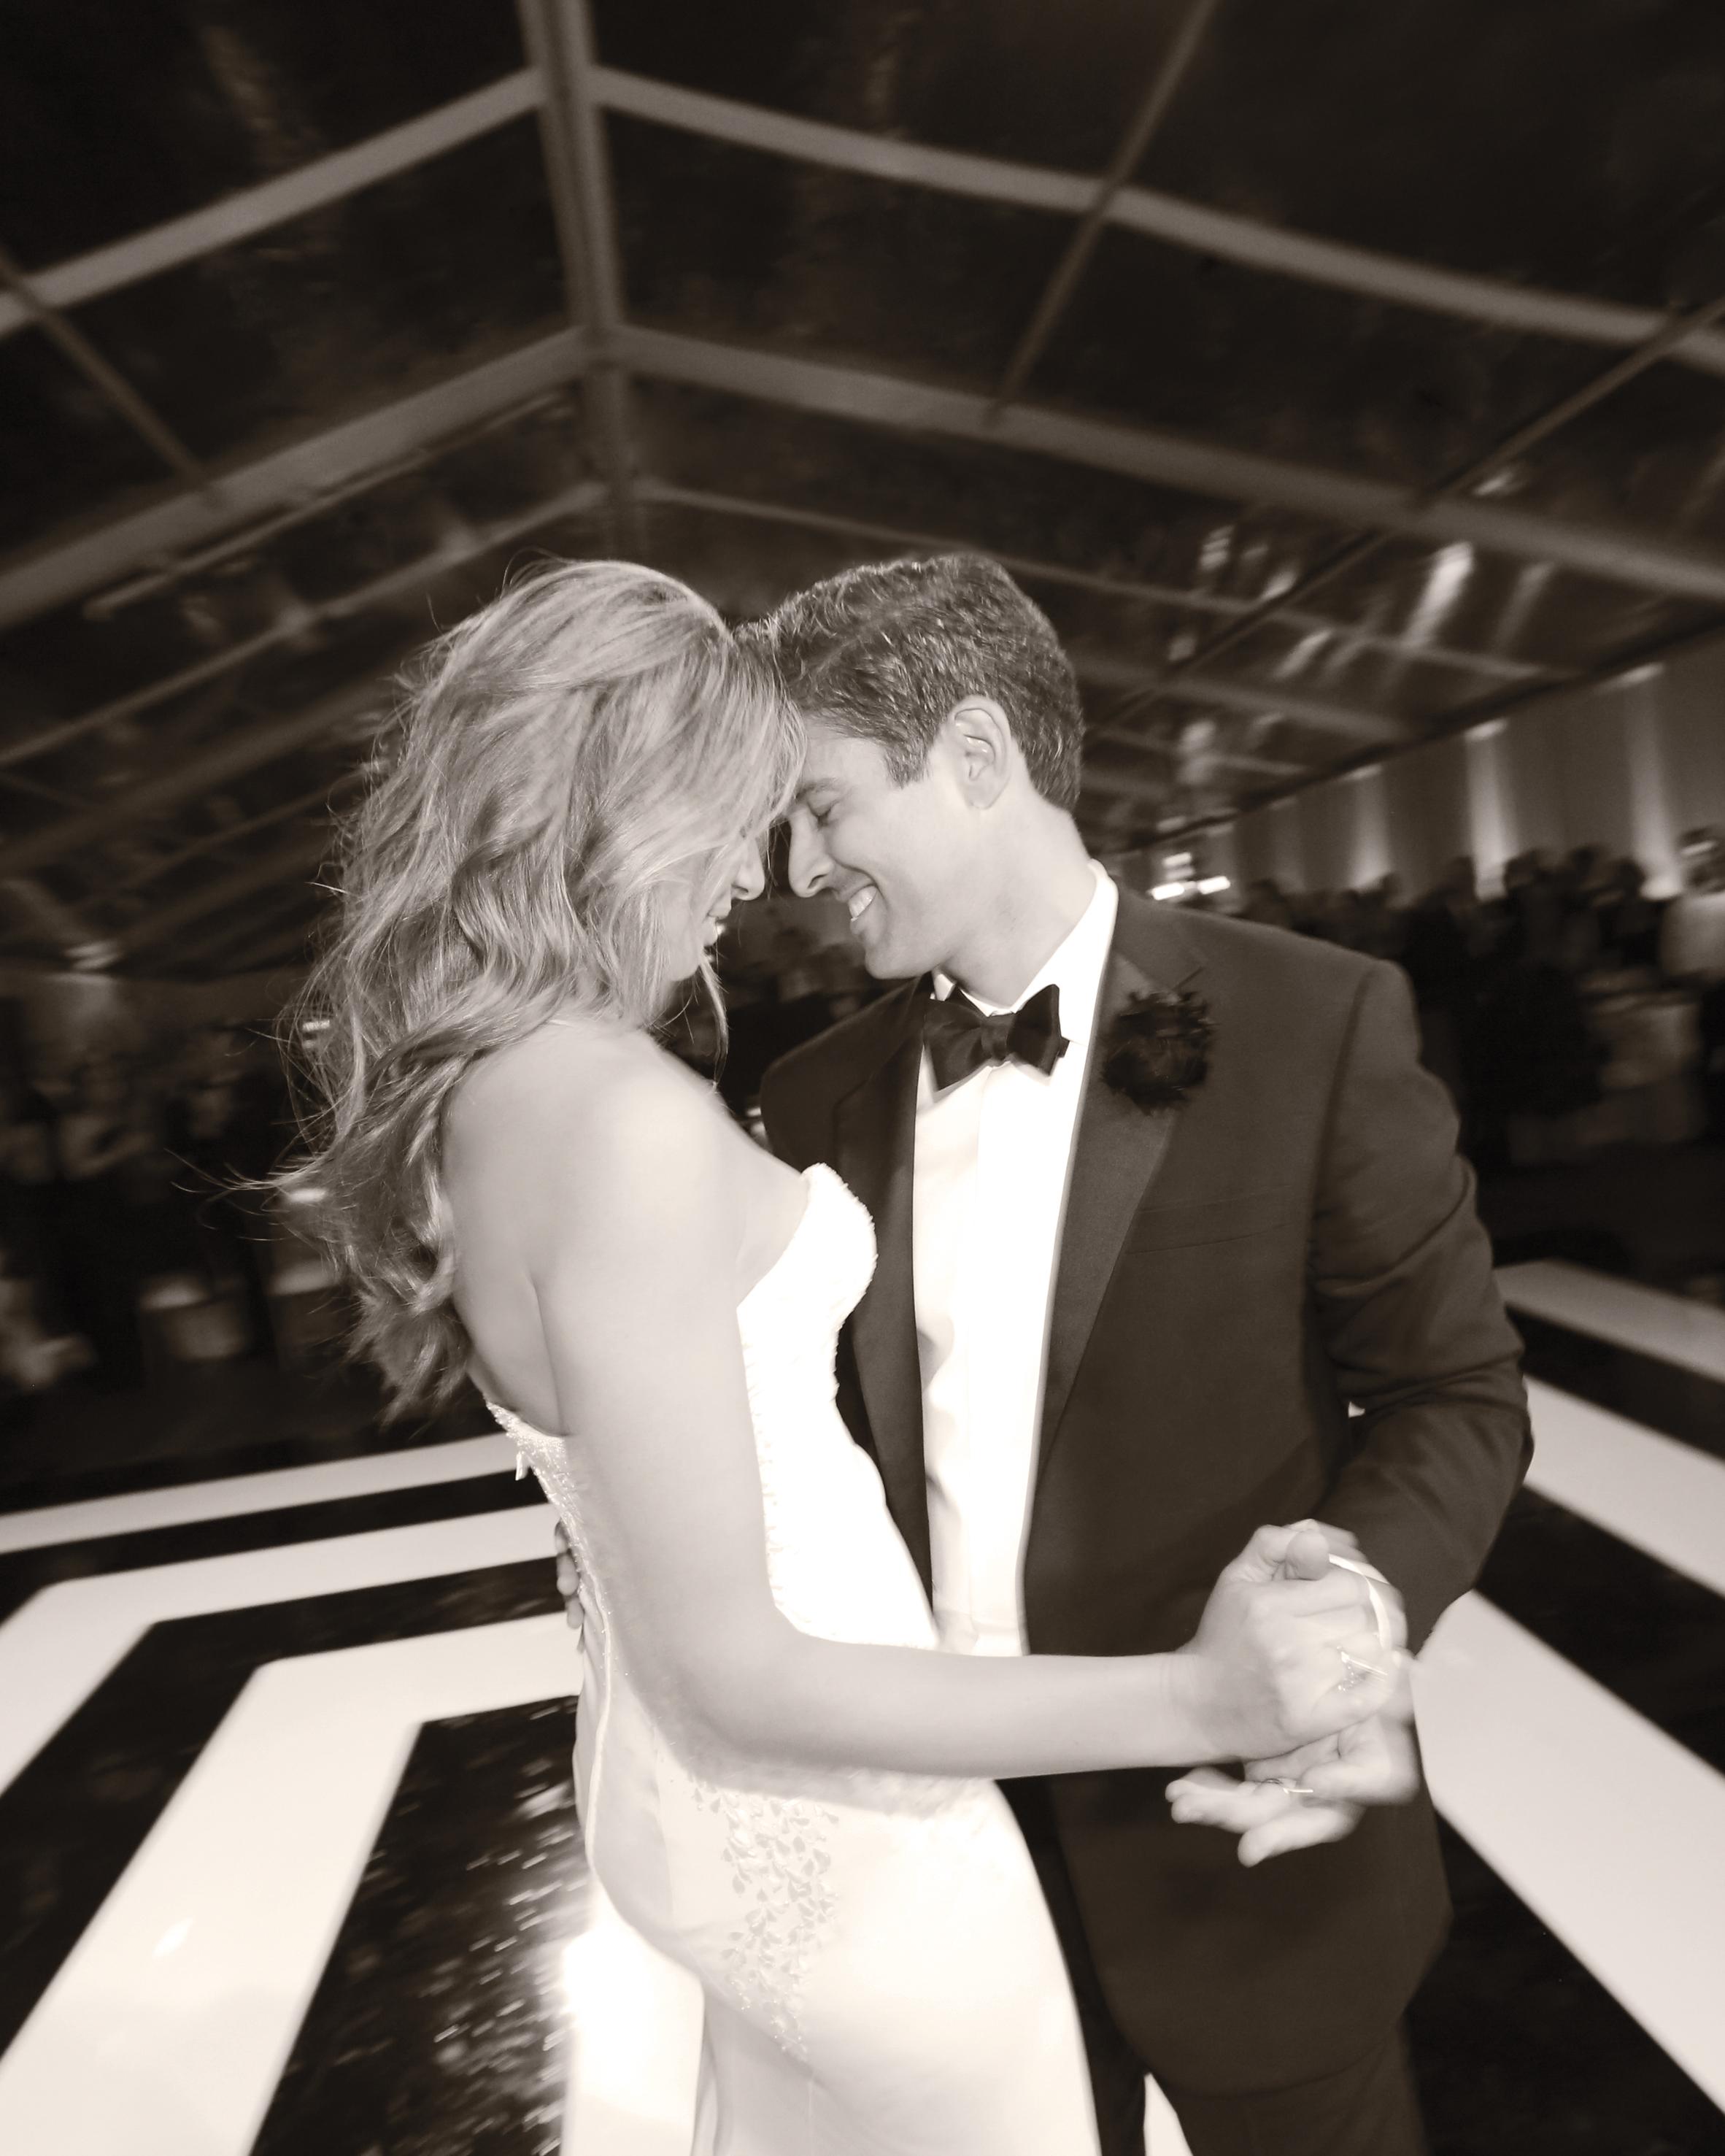 rw-jojo-eric-bride-groom-dance-bw-456-elizabeth-messina-ds111226.jpg